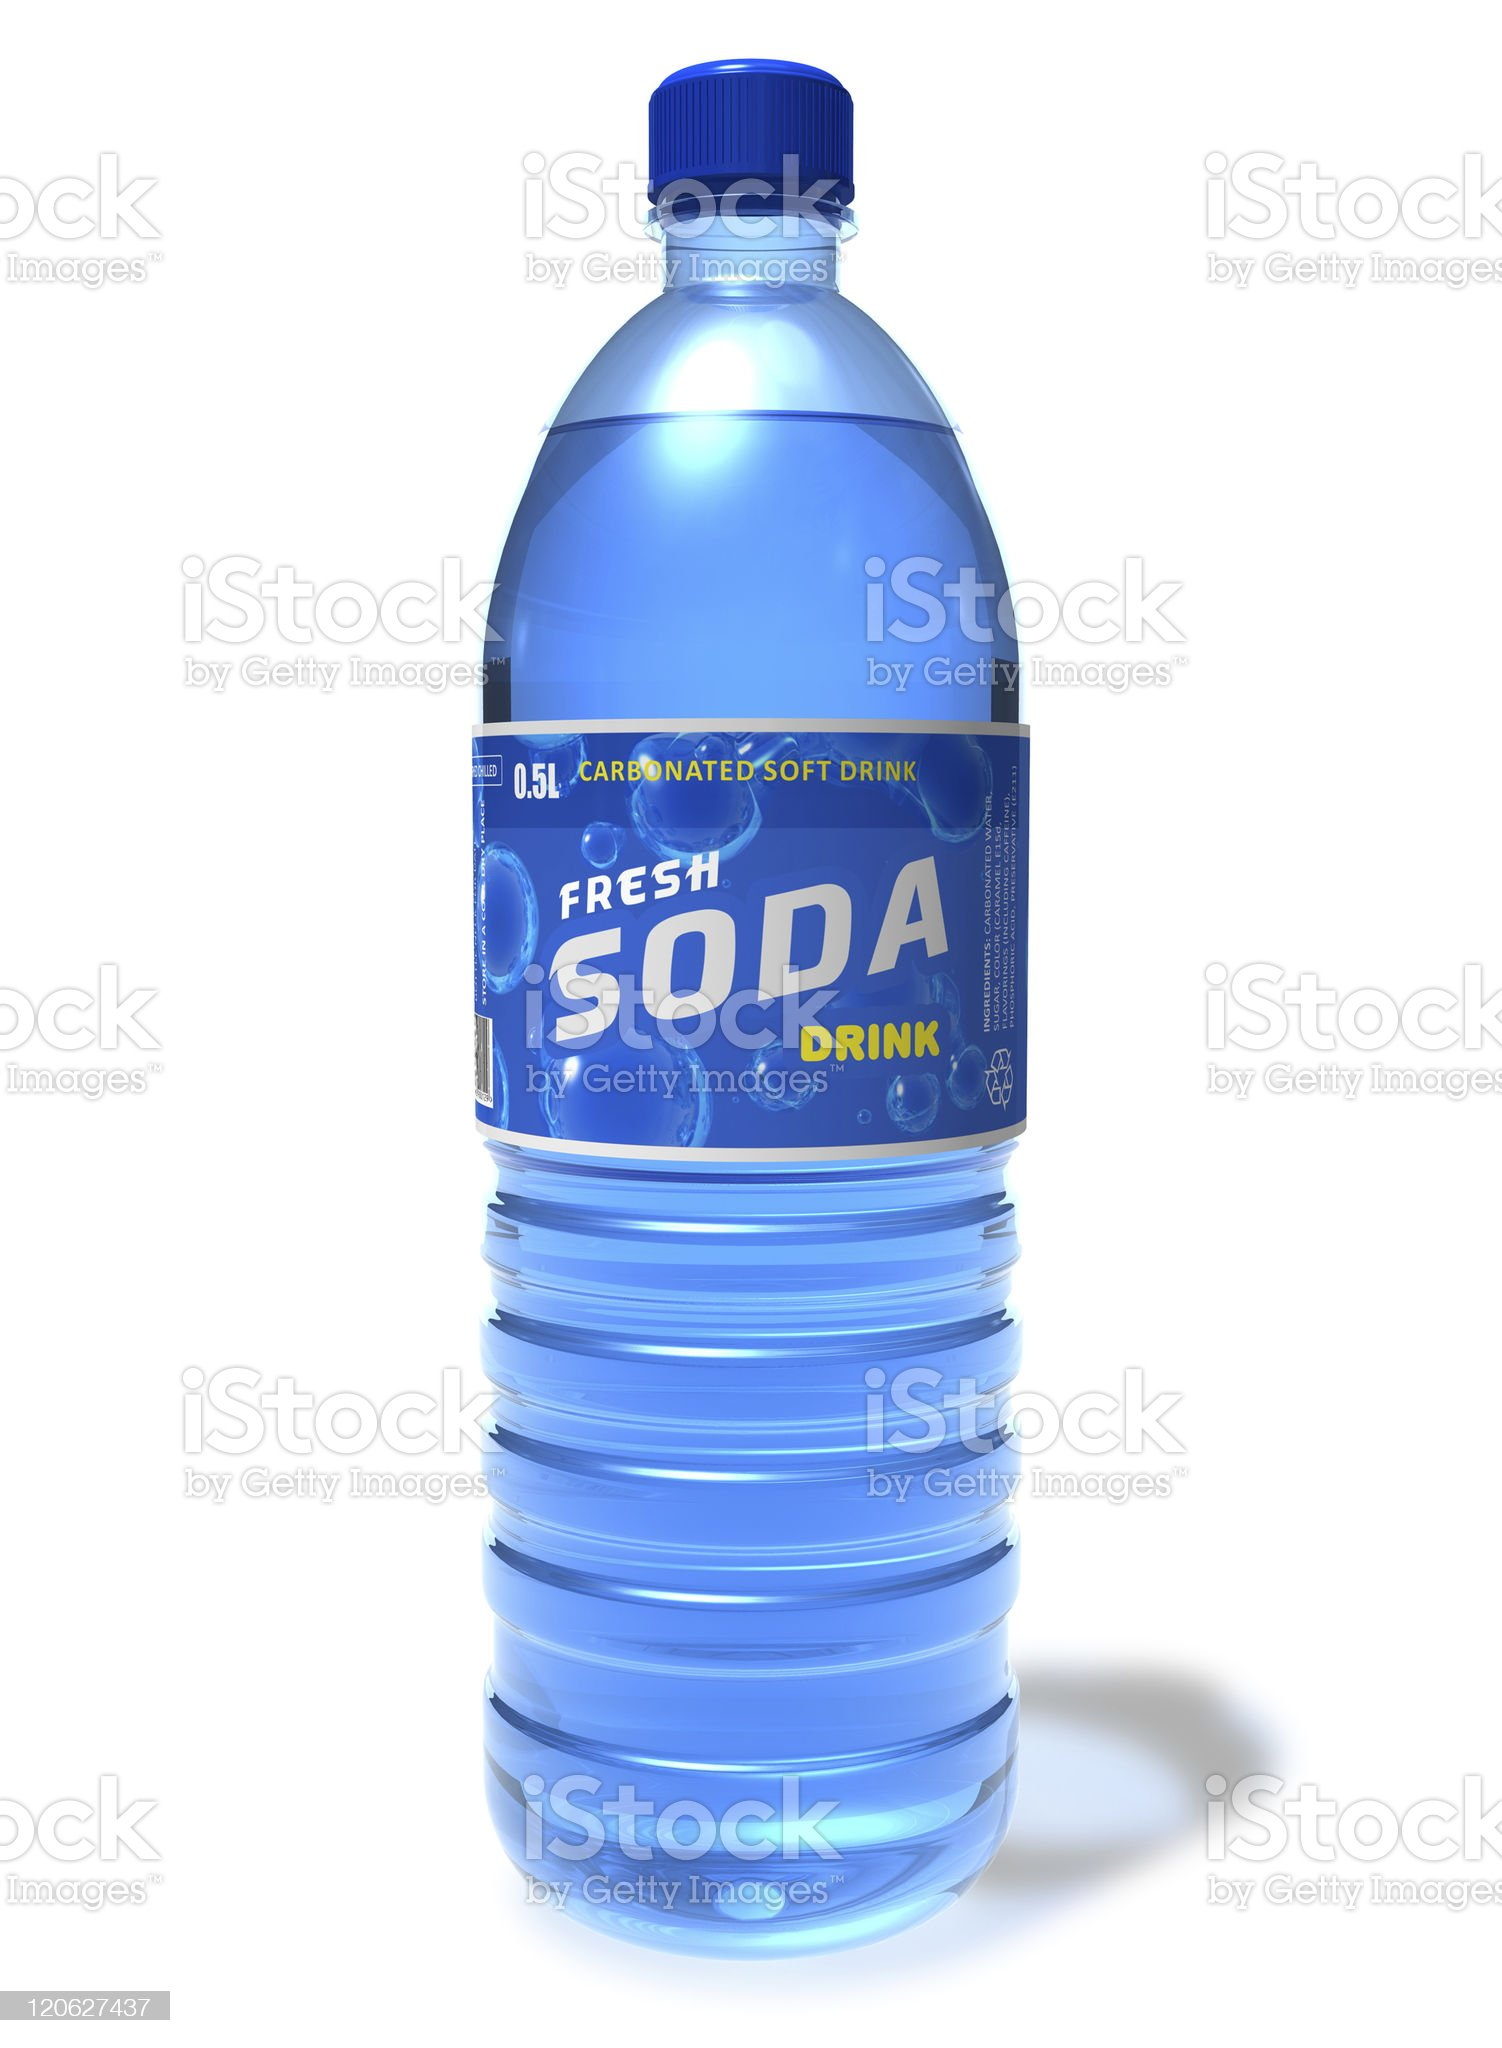 Refreshing soda drink in plastic bottle royalty-free stock photo